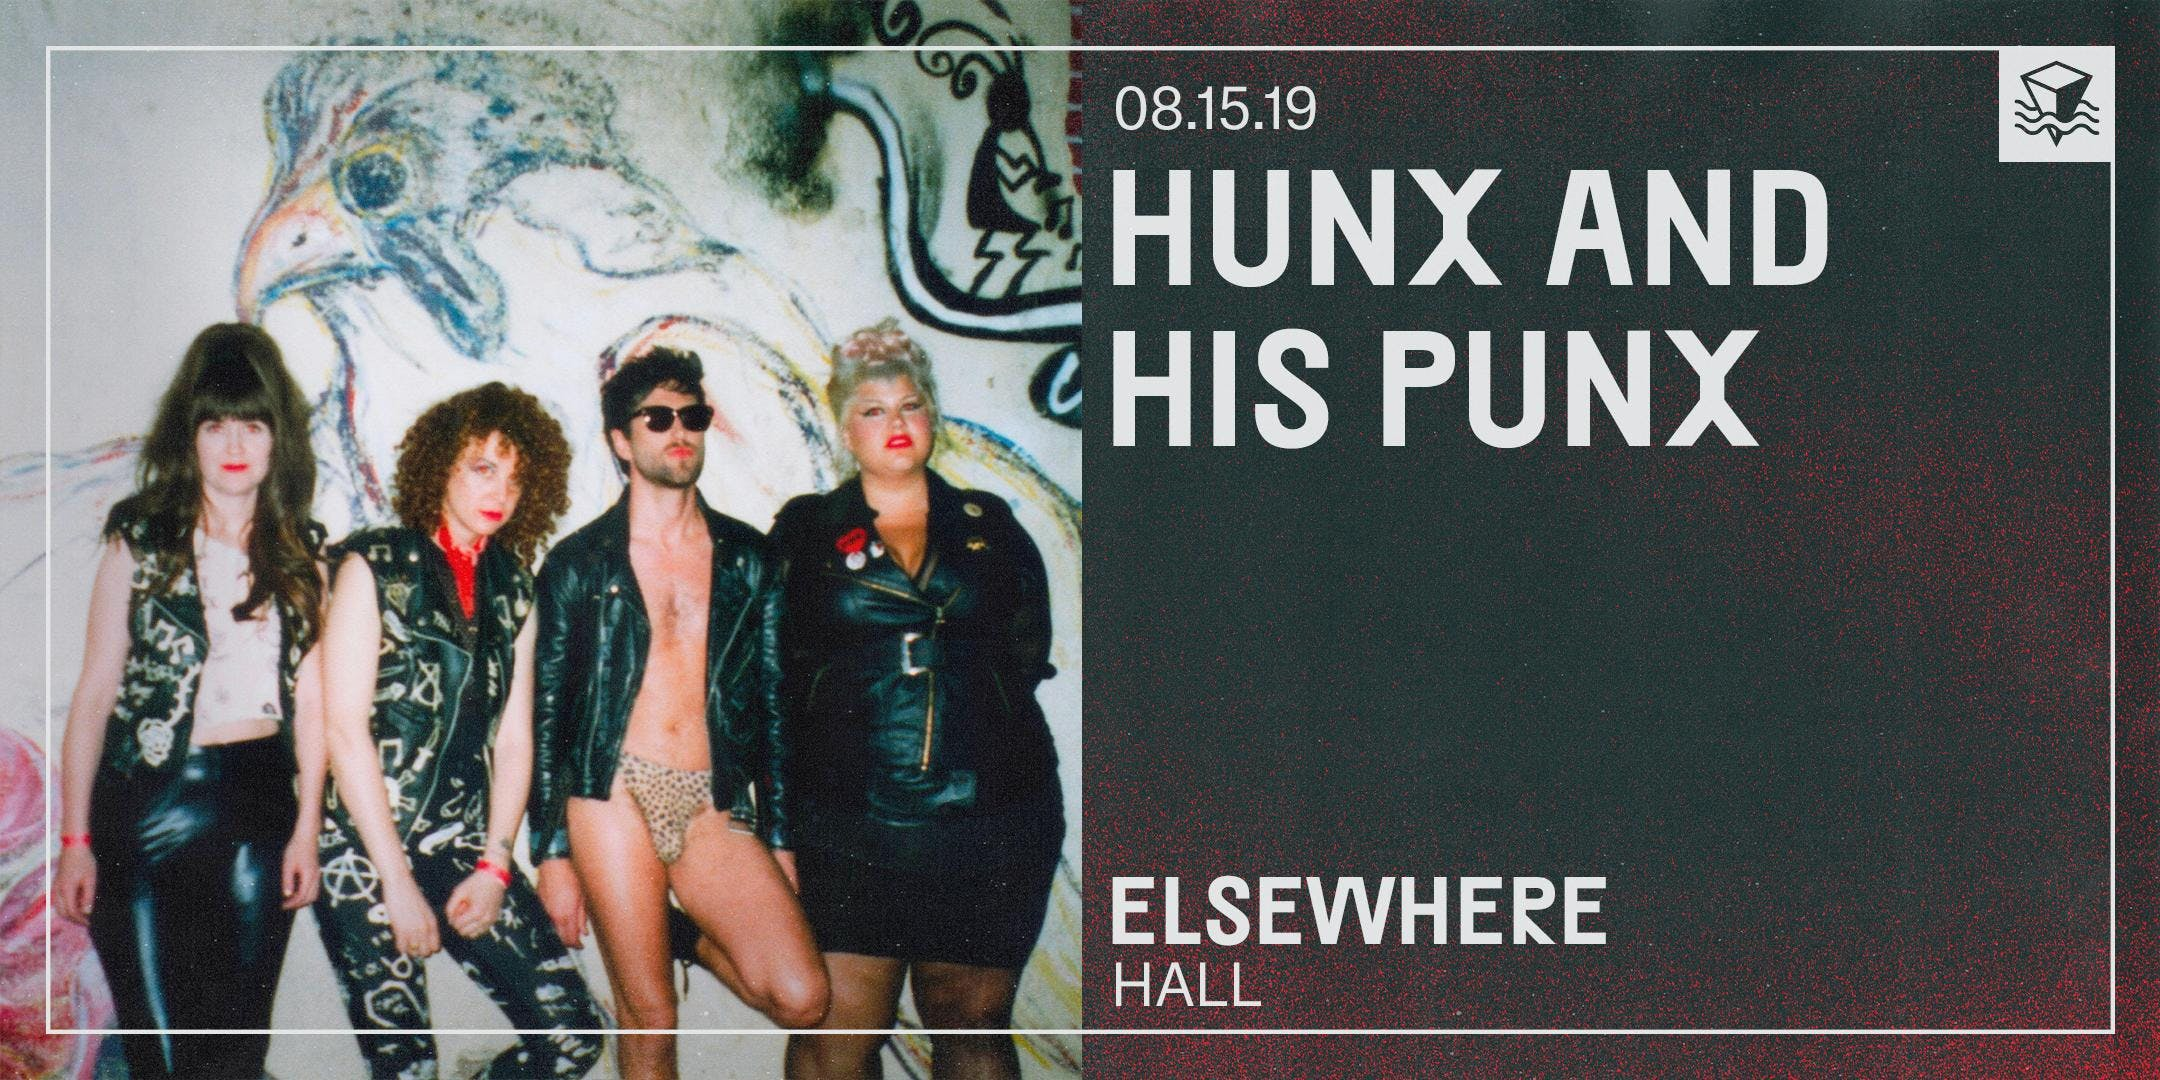 Hunx & His Punx